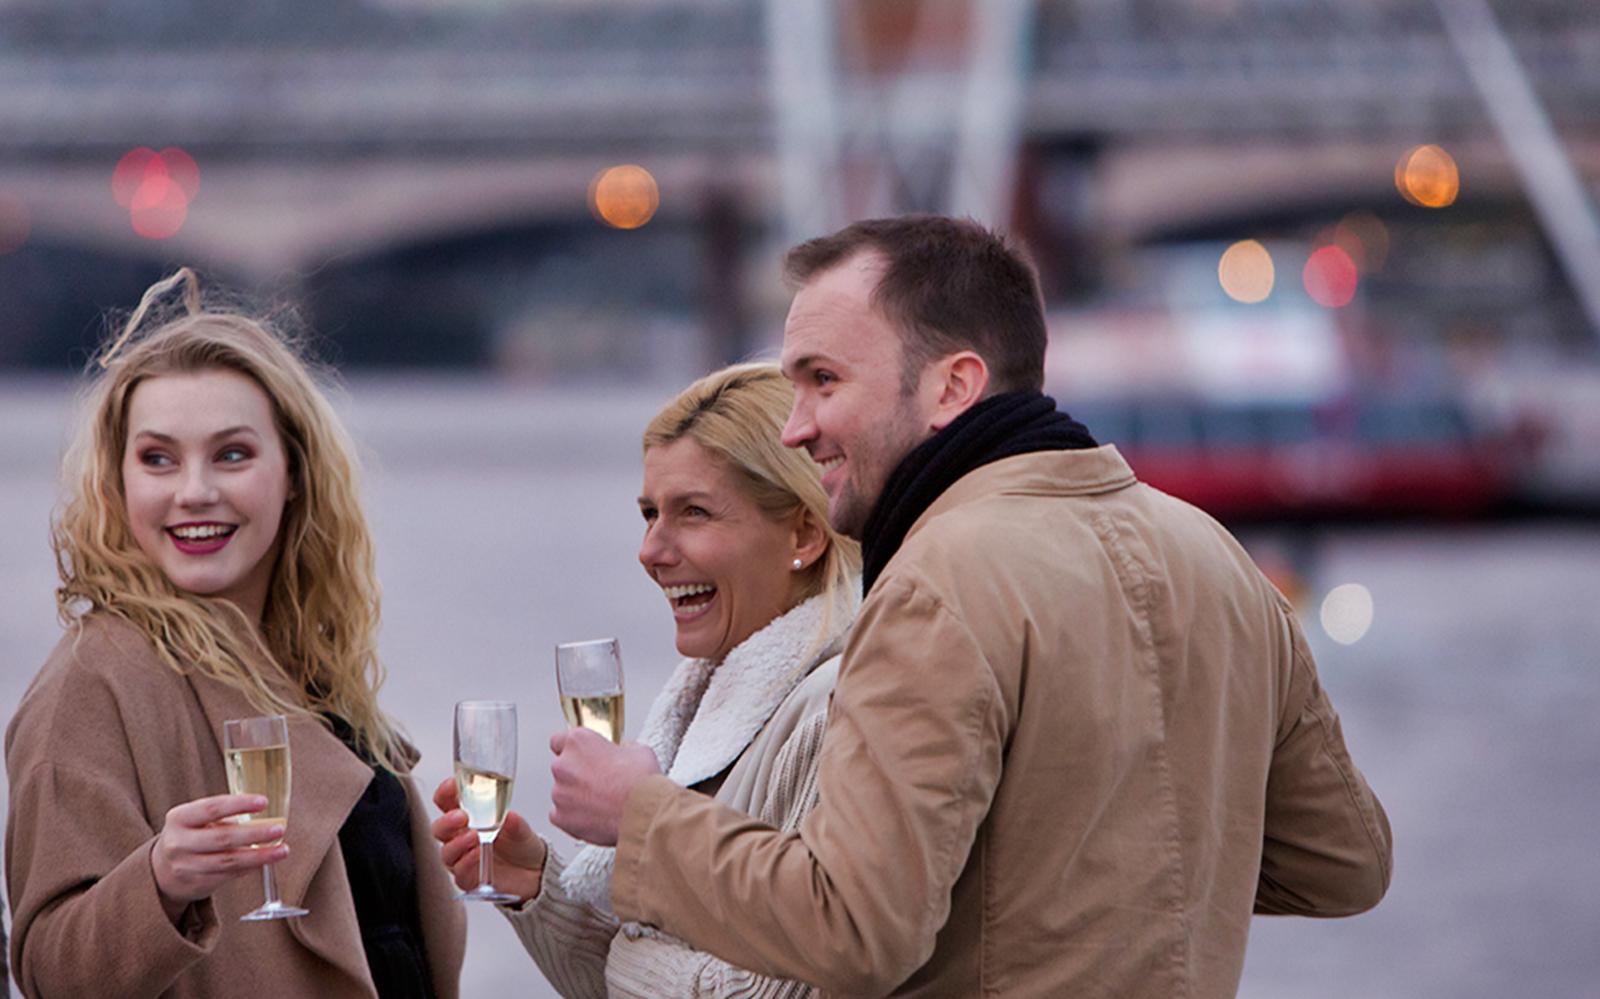 aktivitet dating London